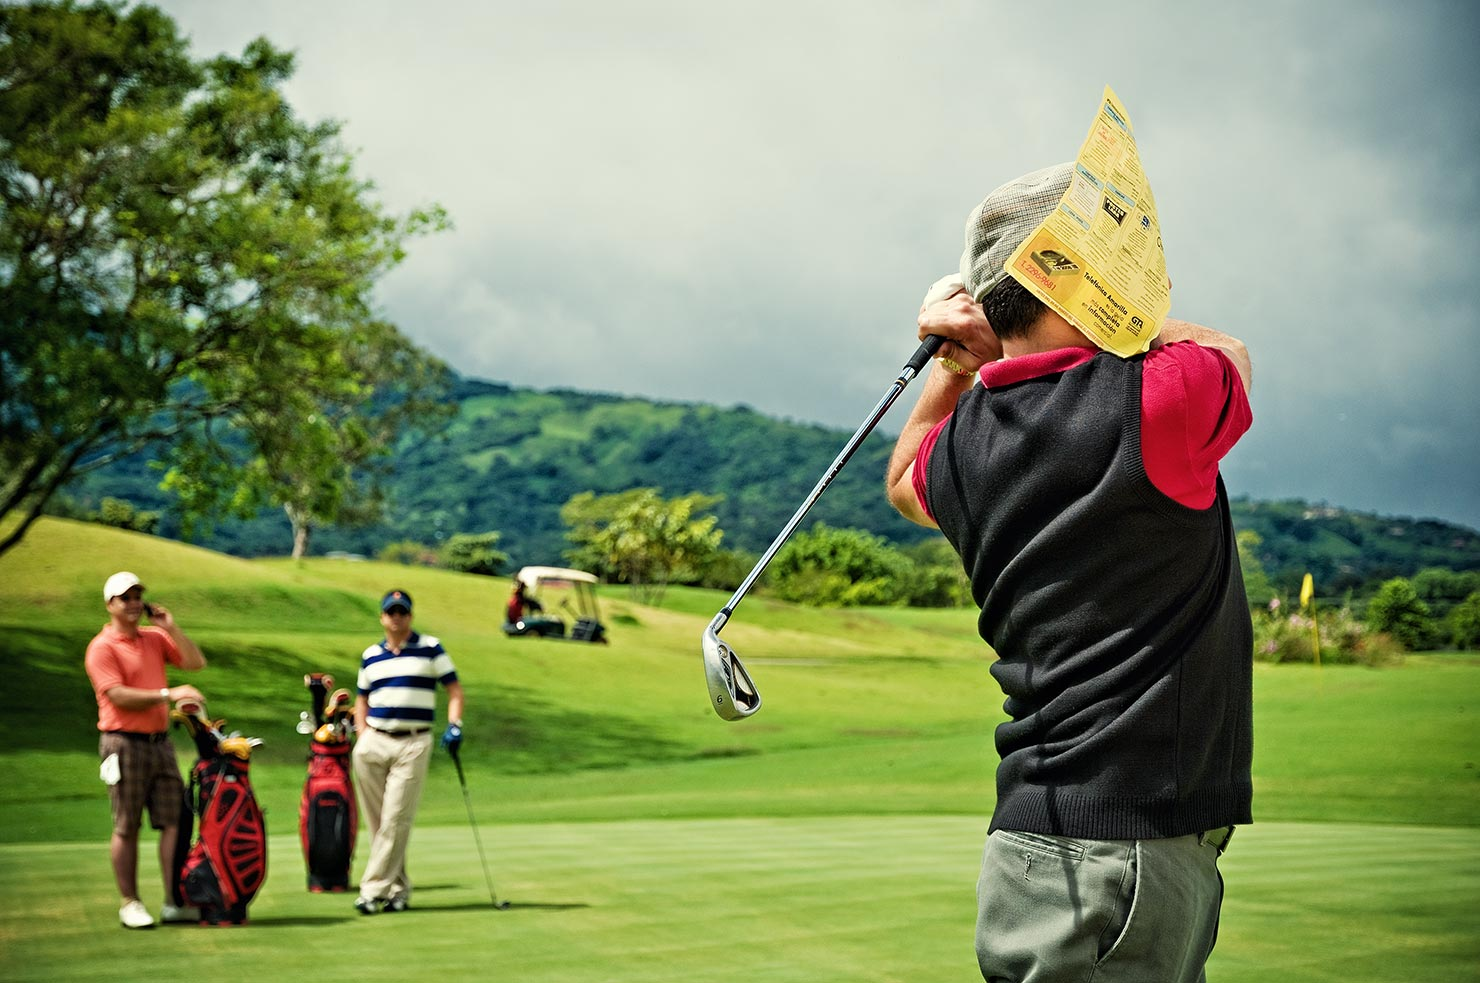 Golf-0026.jpg